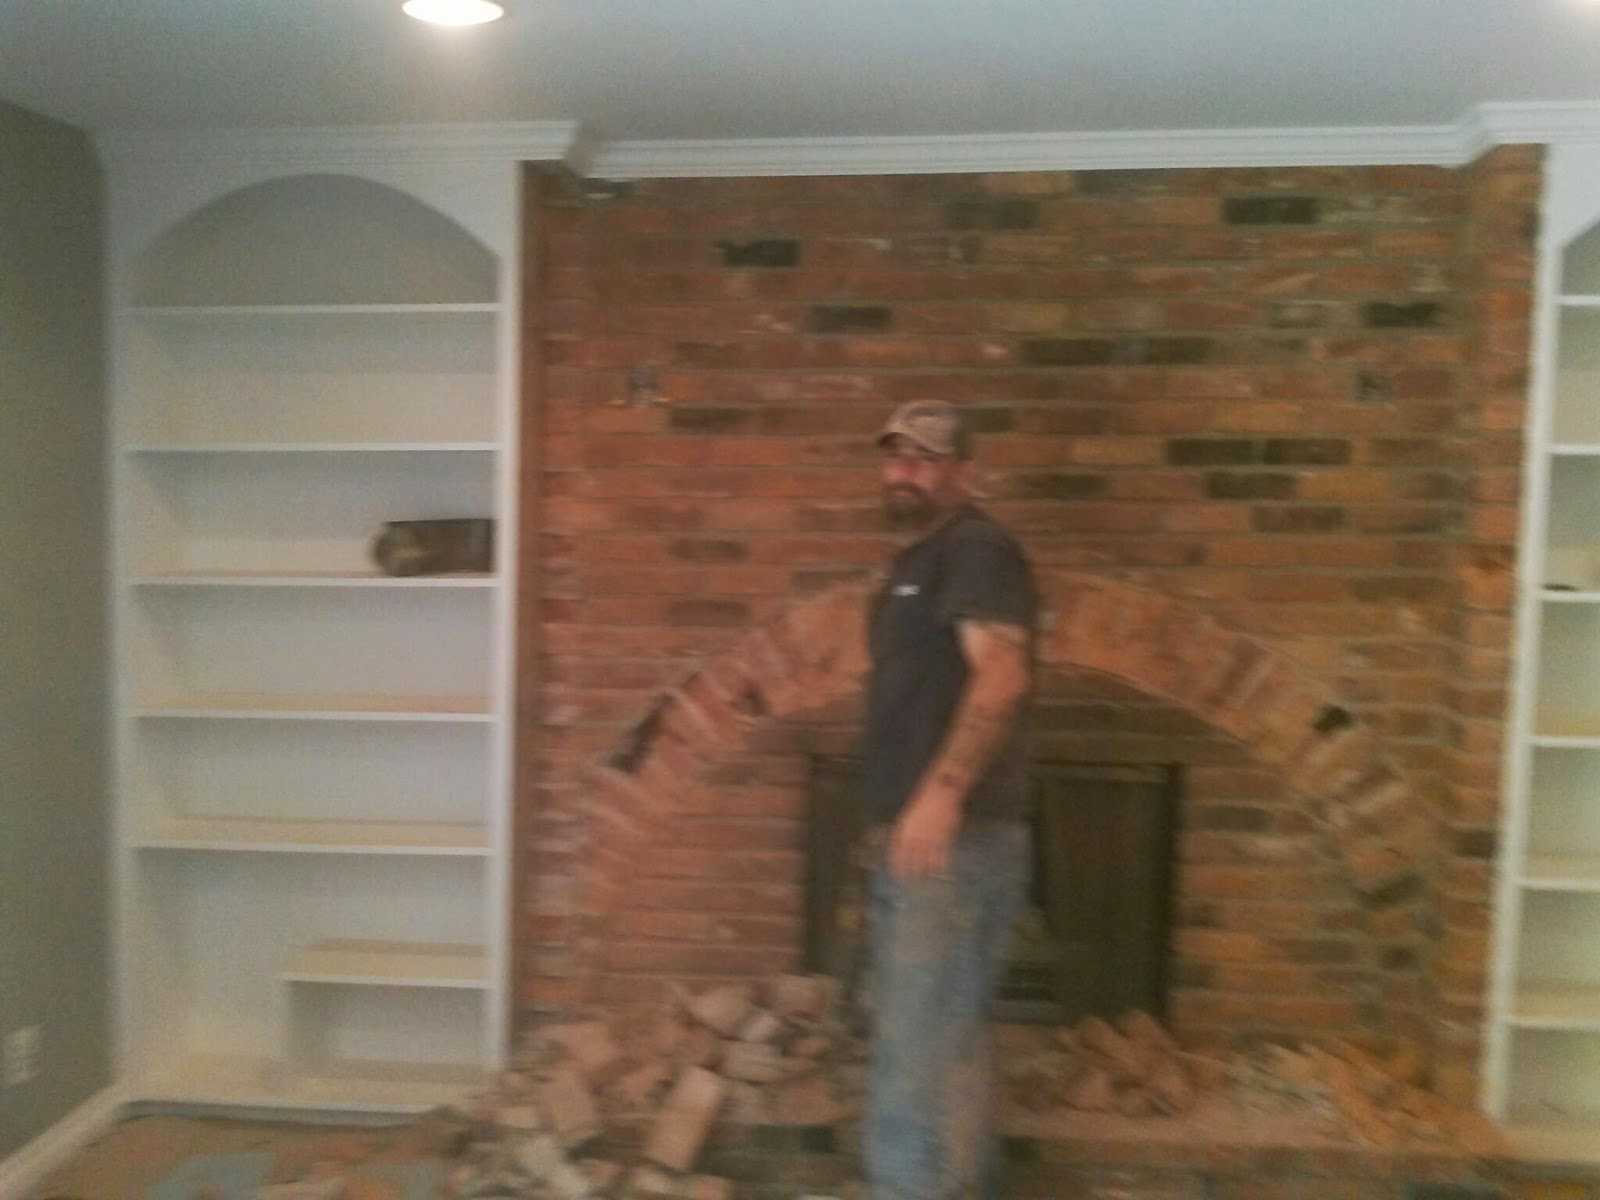 Remarkable Clarkston Fireplaces Repair 313 355 3719 Download Free Architecture Designs Grimeyleaguecom